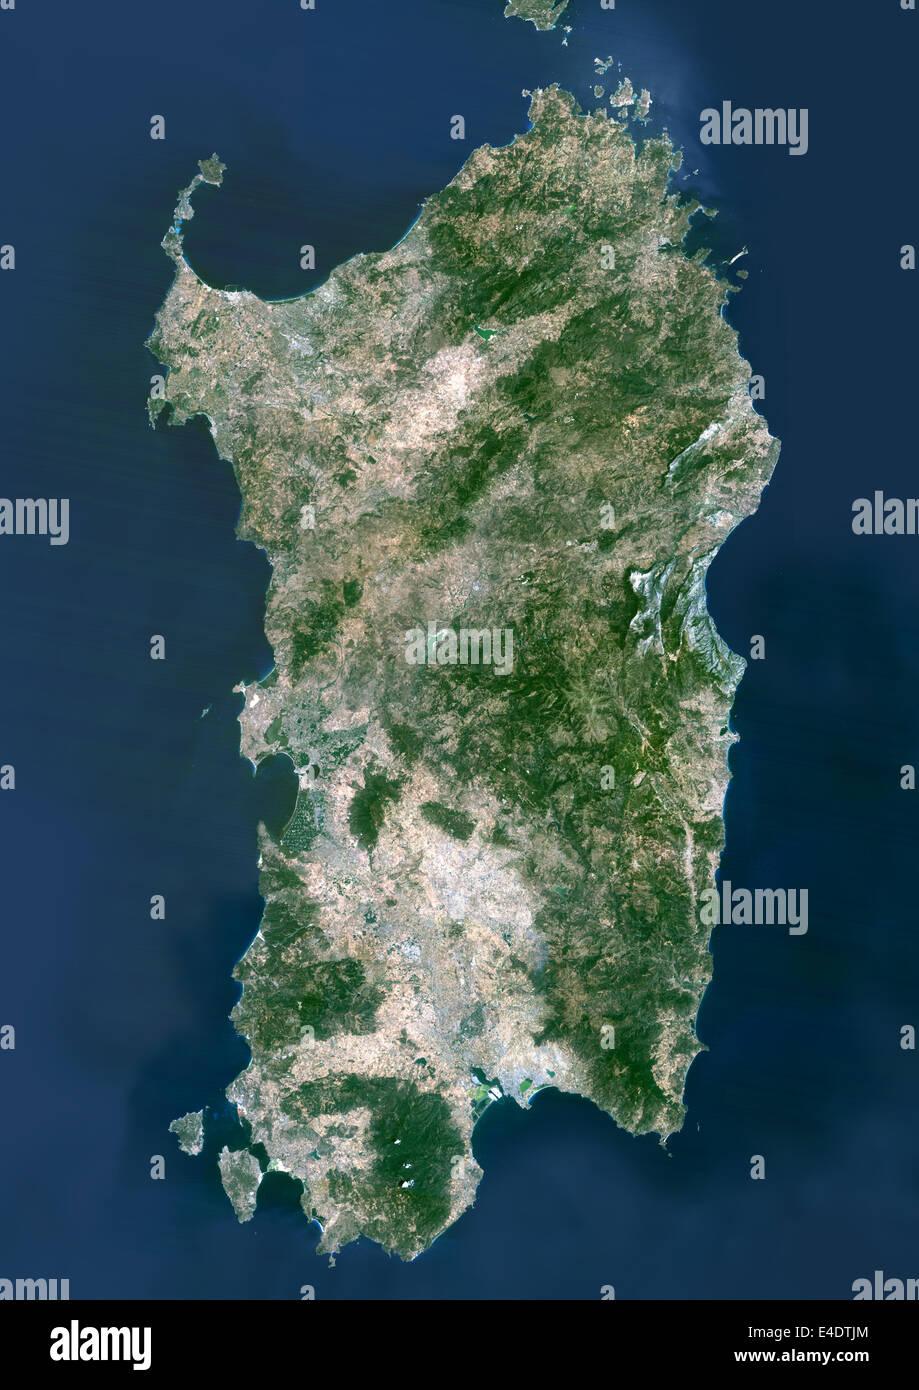 Cartina Sardegna Grande.Sardegna Italia True Color Satellitare Immagine Sardegna Italia True Color Immagine Satellitare Della Sardegna La Seconda Piu Grande Islan Foto Stock Alamy